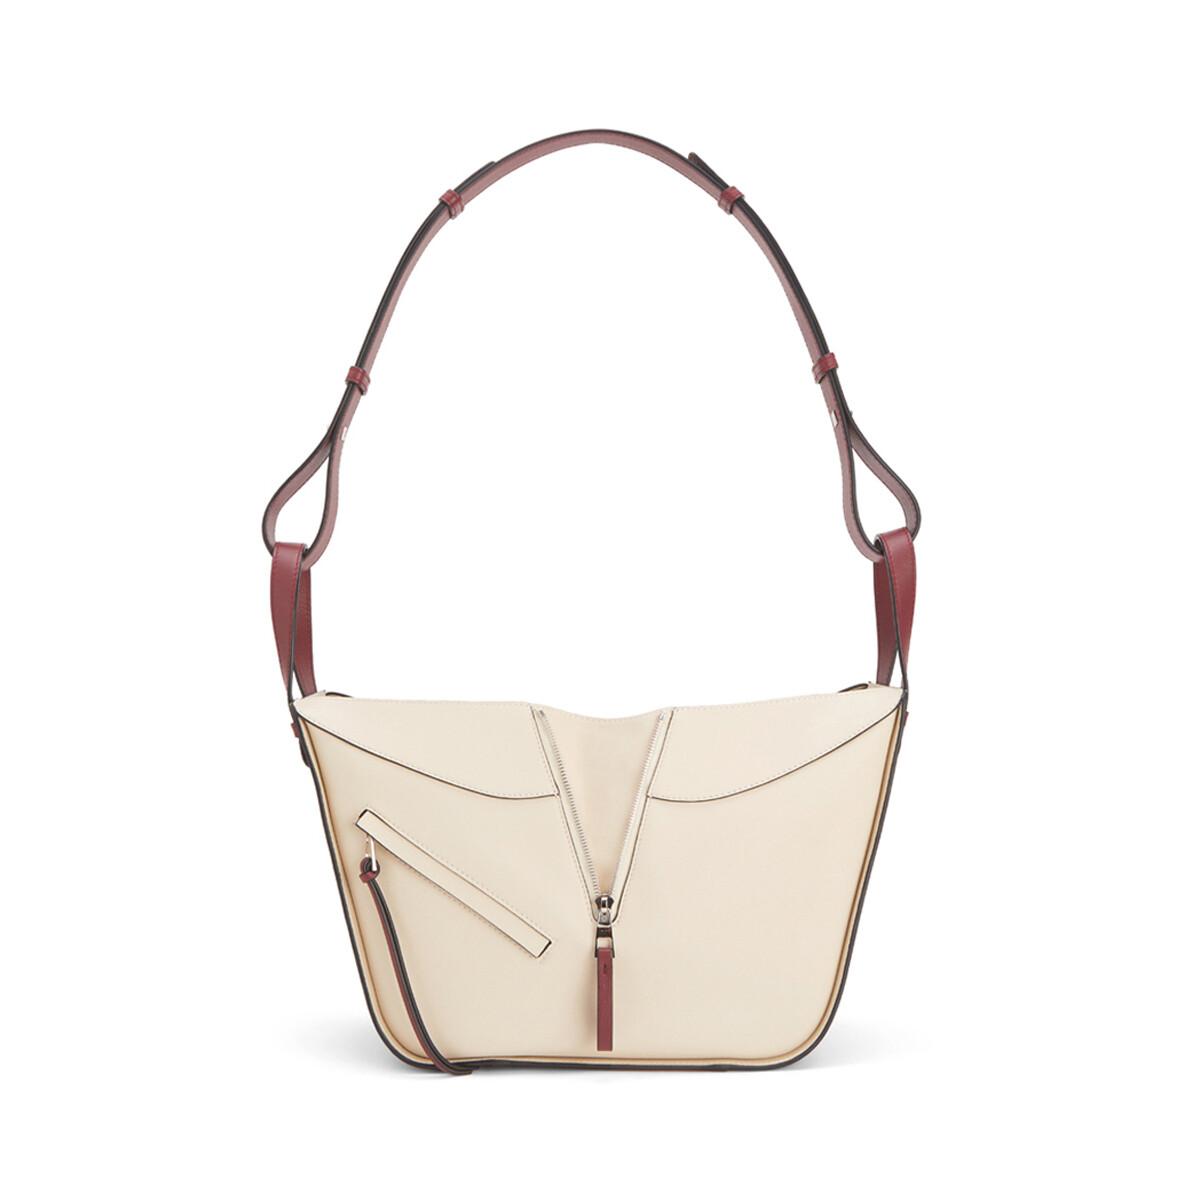 LOEWE Hammock Small Bag Garnet/Ivory front